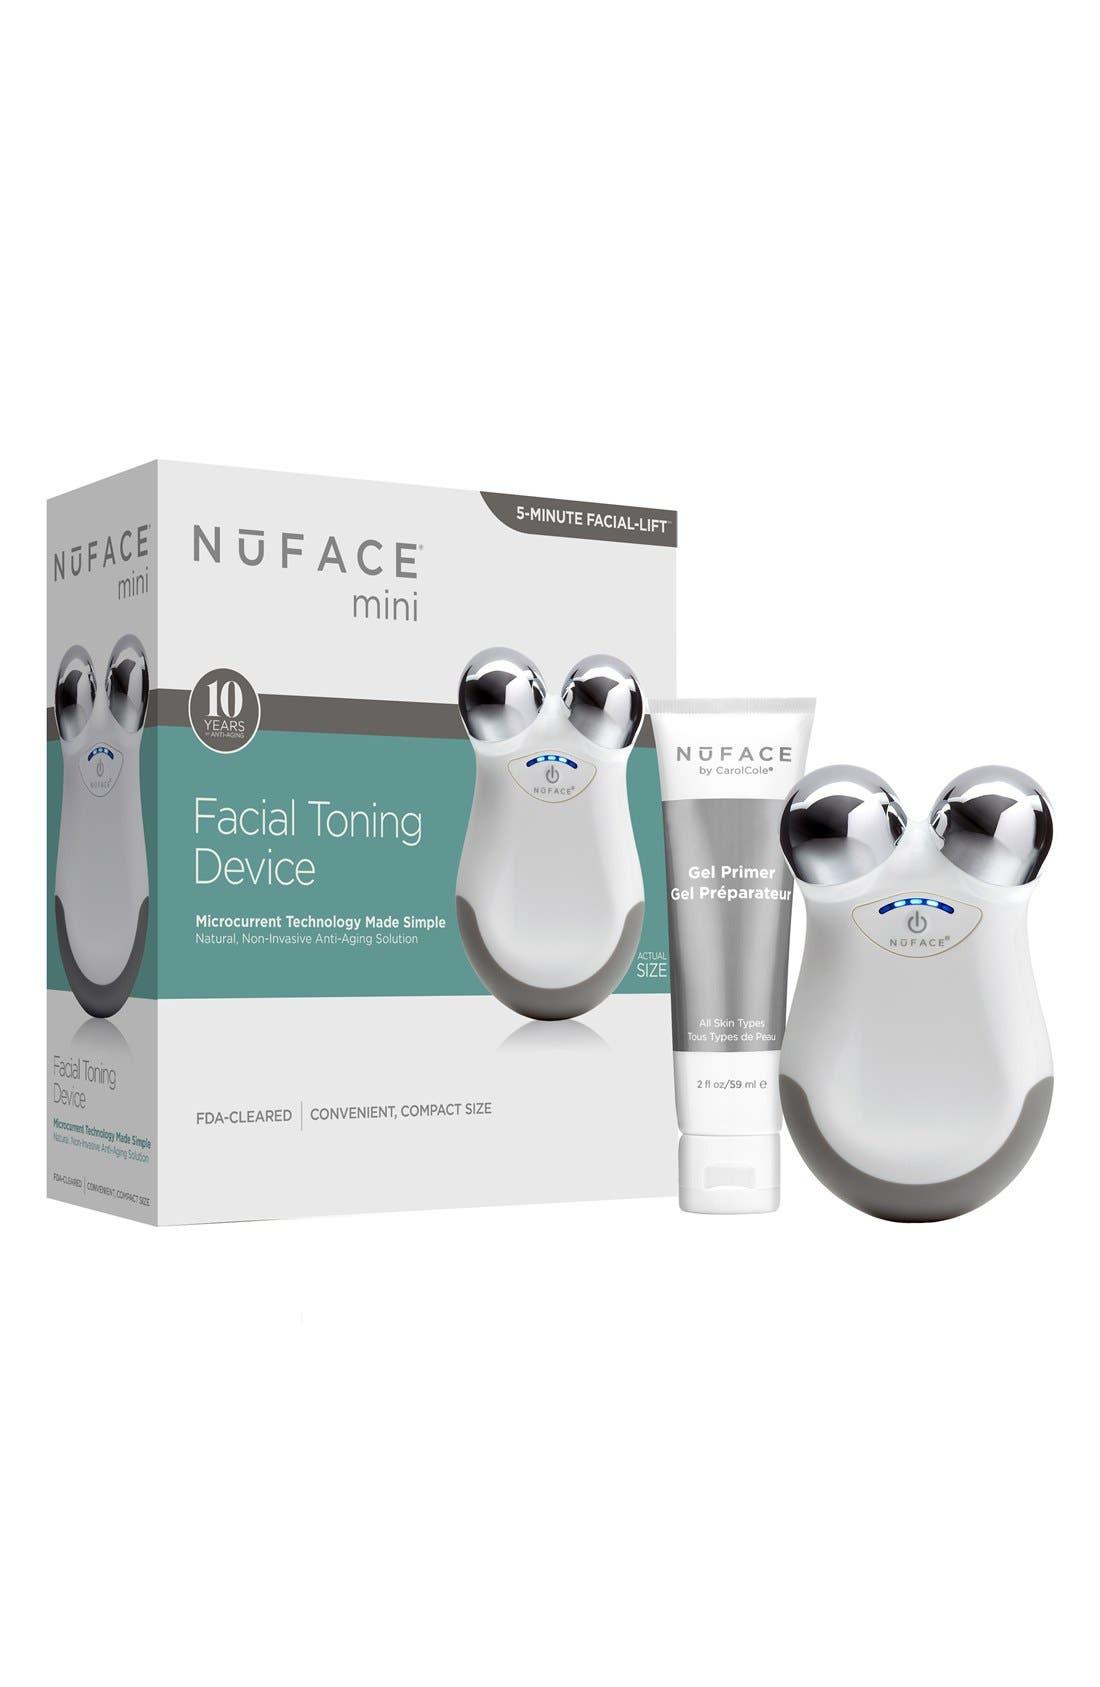 NuFACE® mini Facial Toning Device